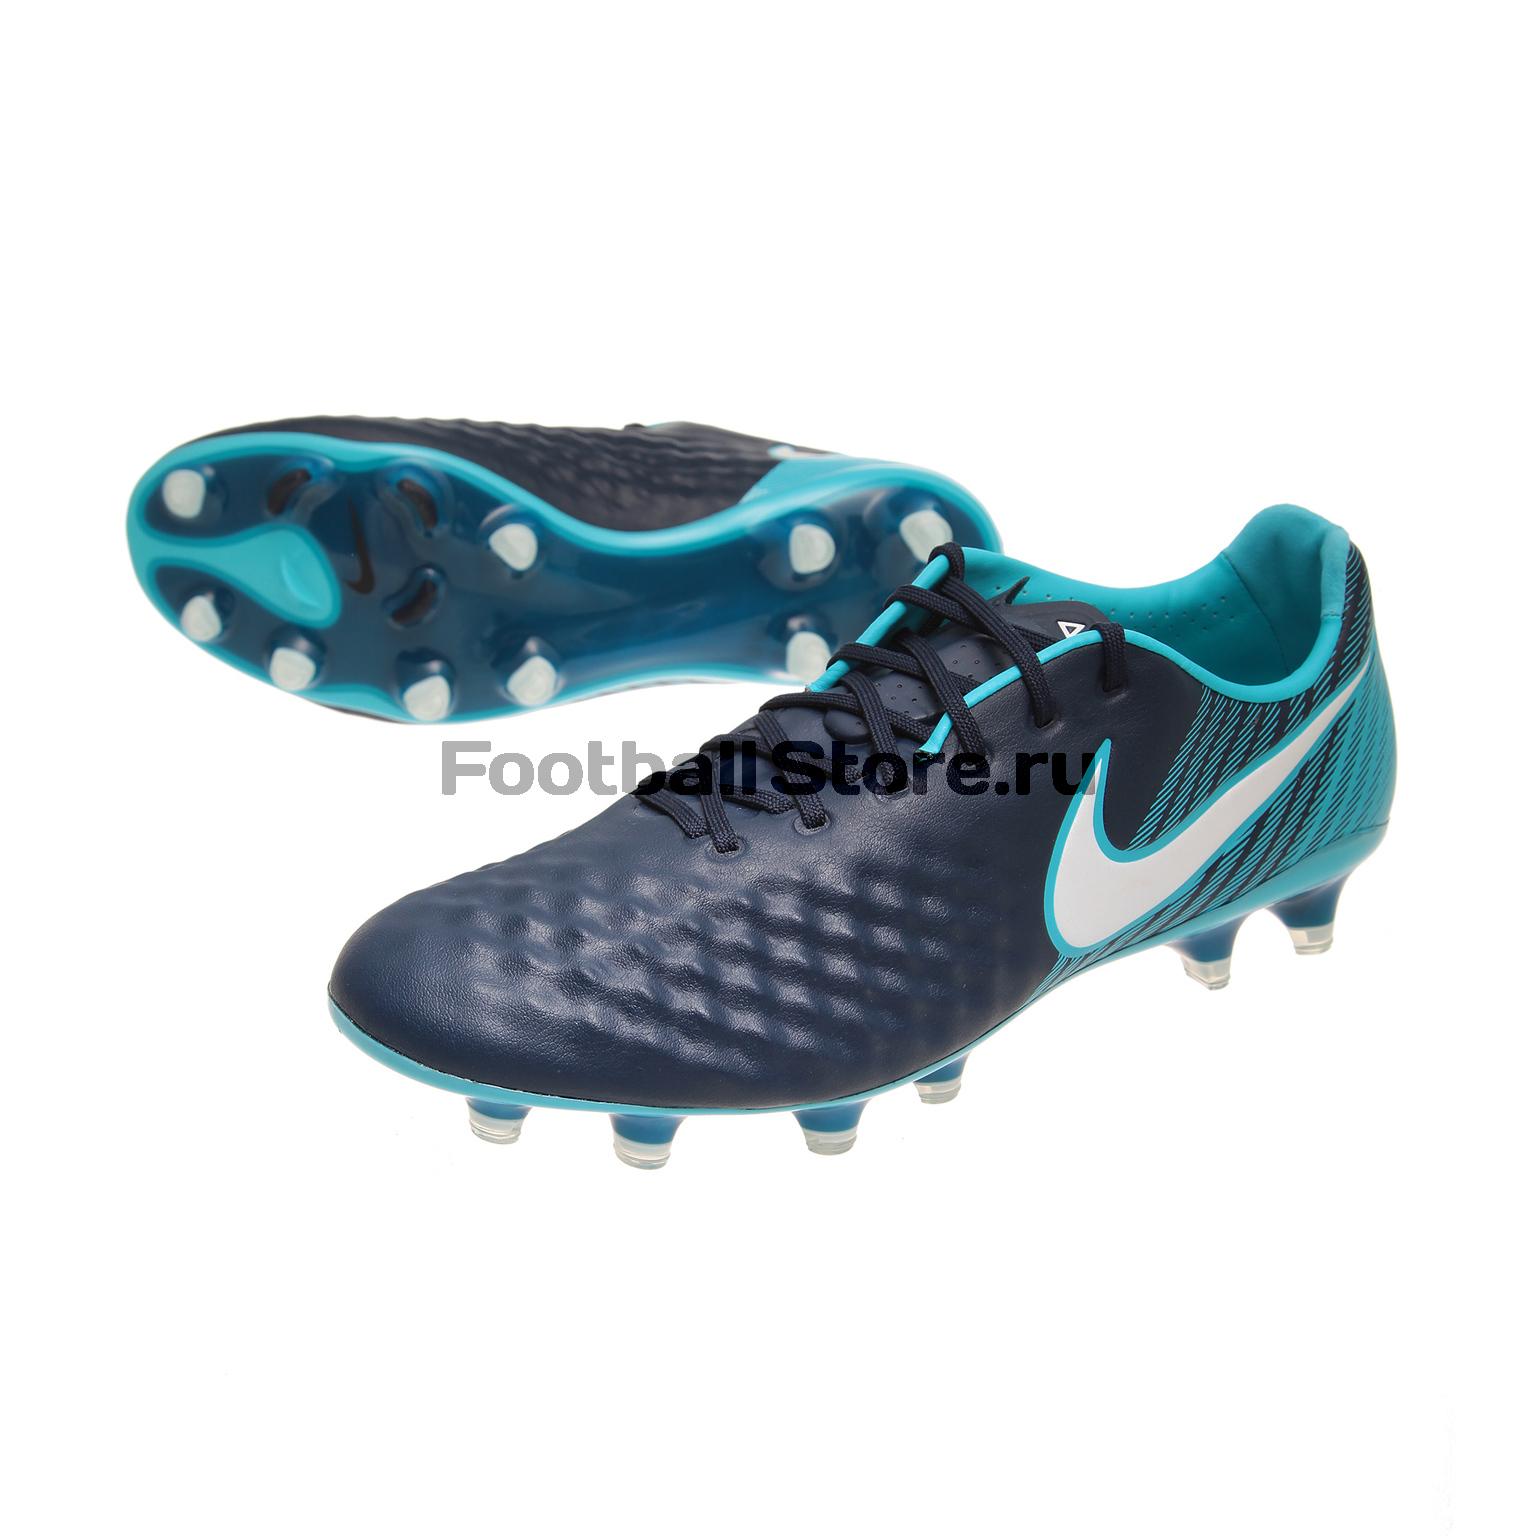 Бутсы Nike Magista Opus II FG 843813-414 nike бутсы nike magista obra ii fg 844595 008